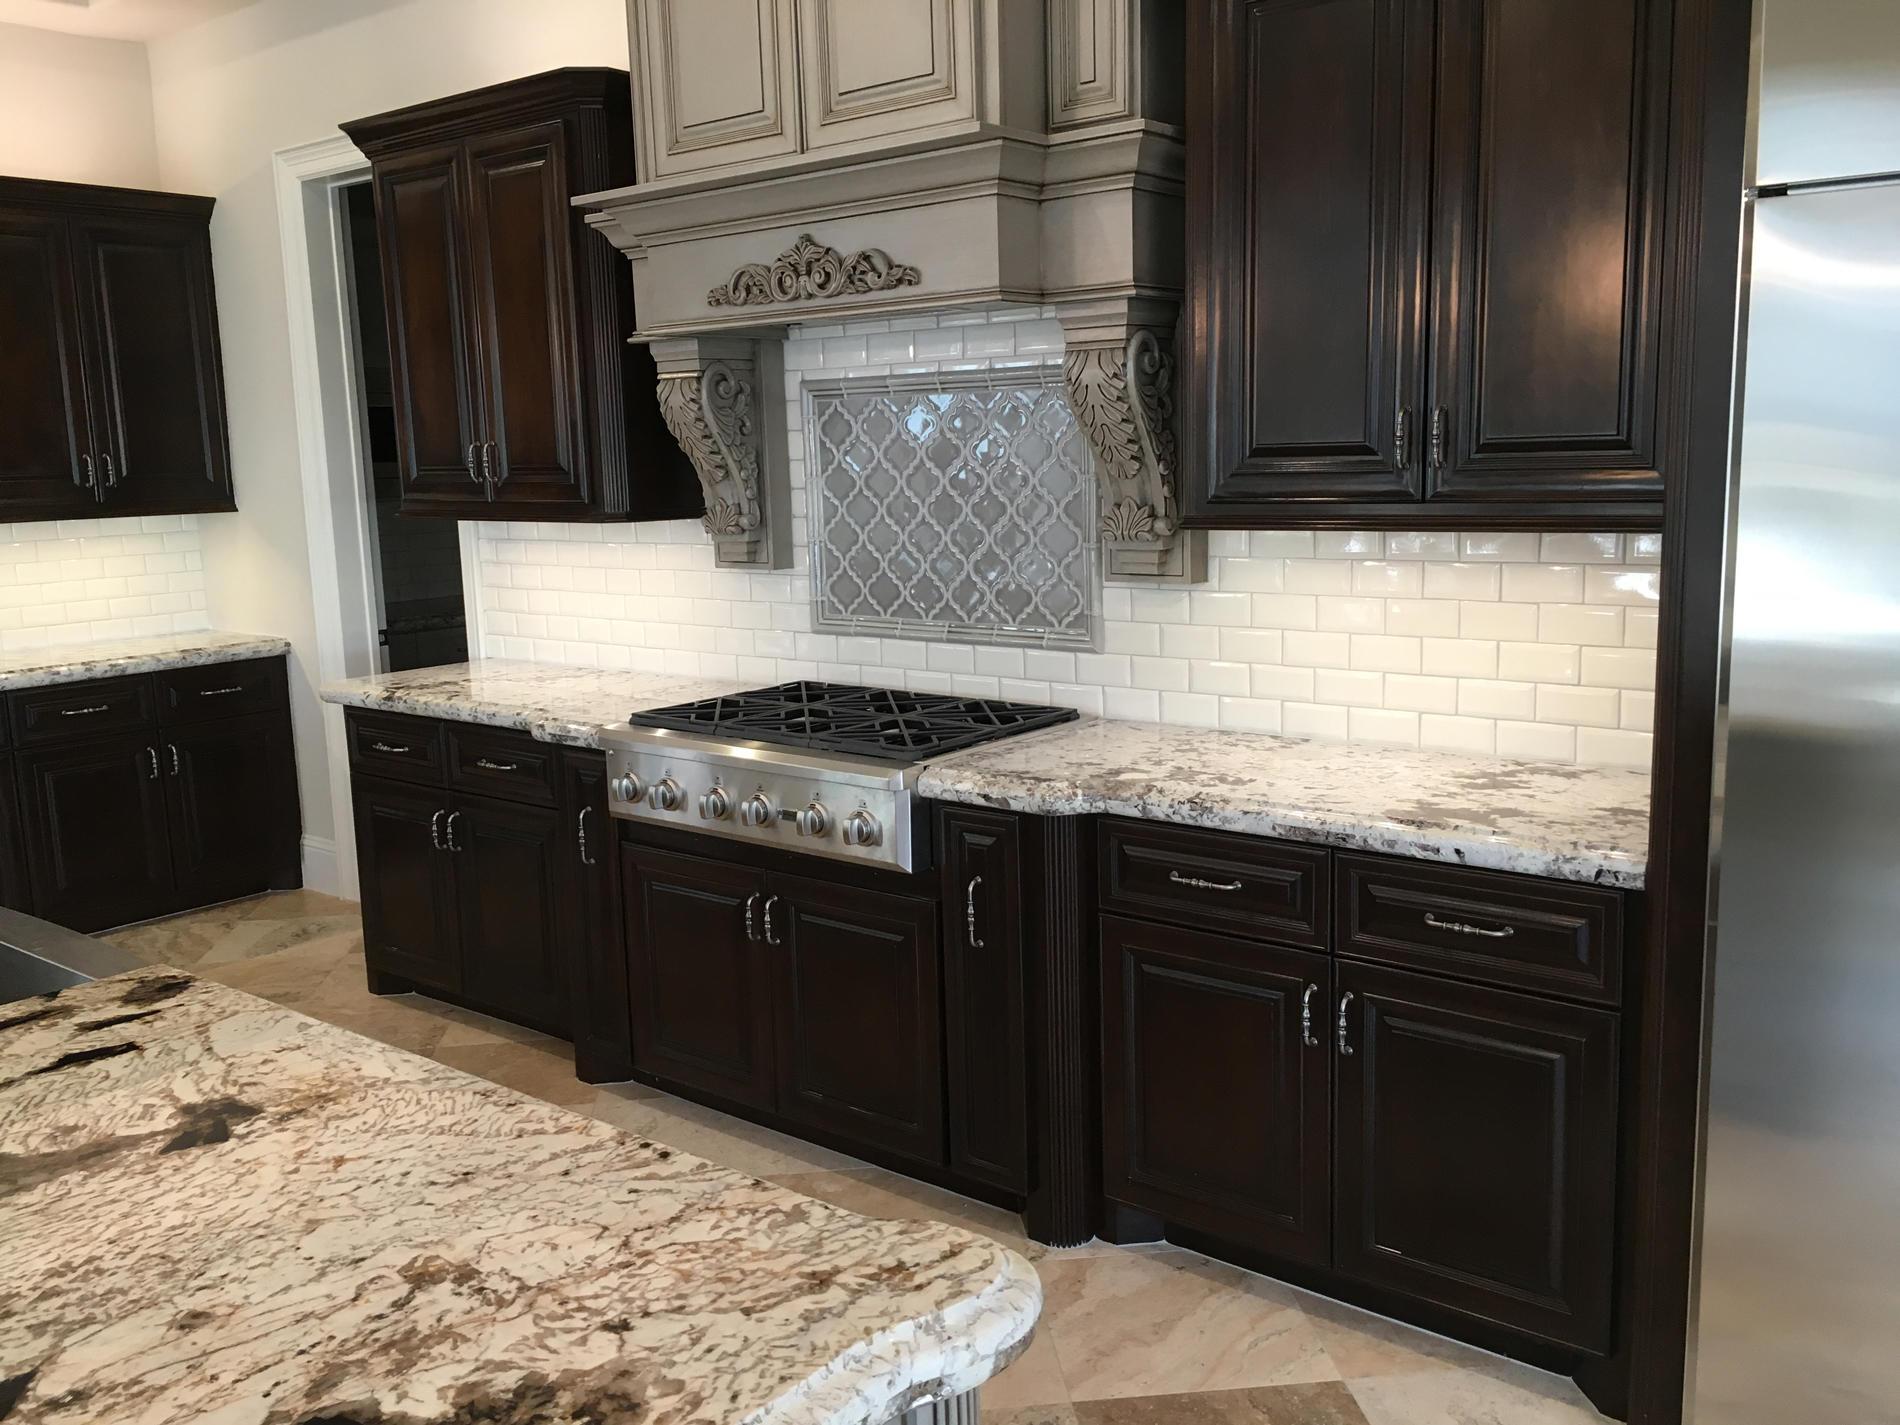 Artech design inc - DBA Floors Kitchen and Bath image 23